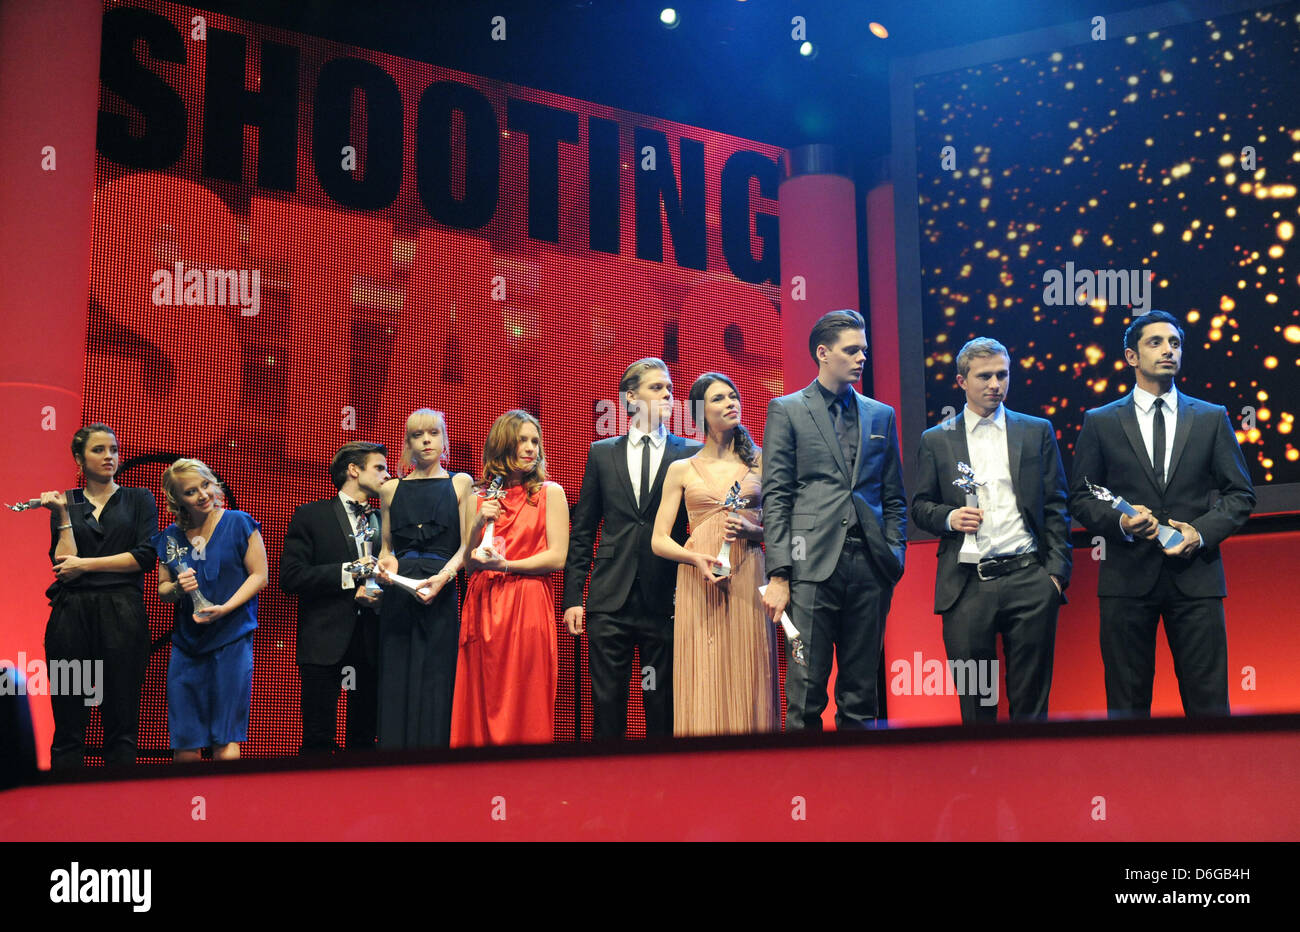 The Shooting Stars 2012 (L-R): Actors Adele Haenel (France), Anna Maria Muehe (Germany), Hilmar Gudjonsson (Iceland), - Stock Image